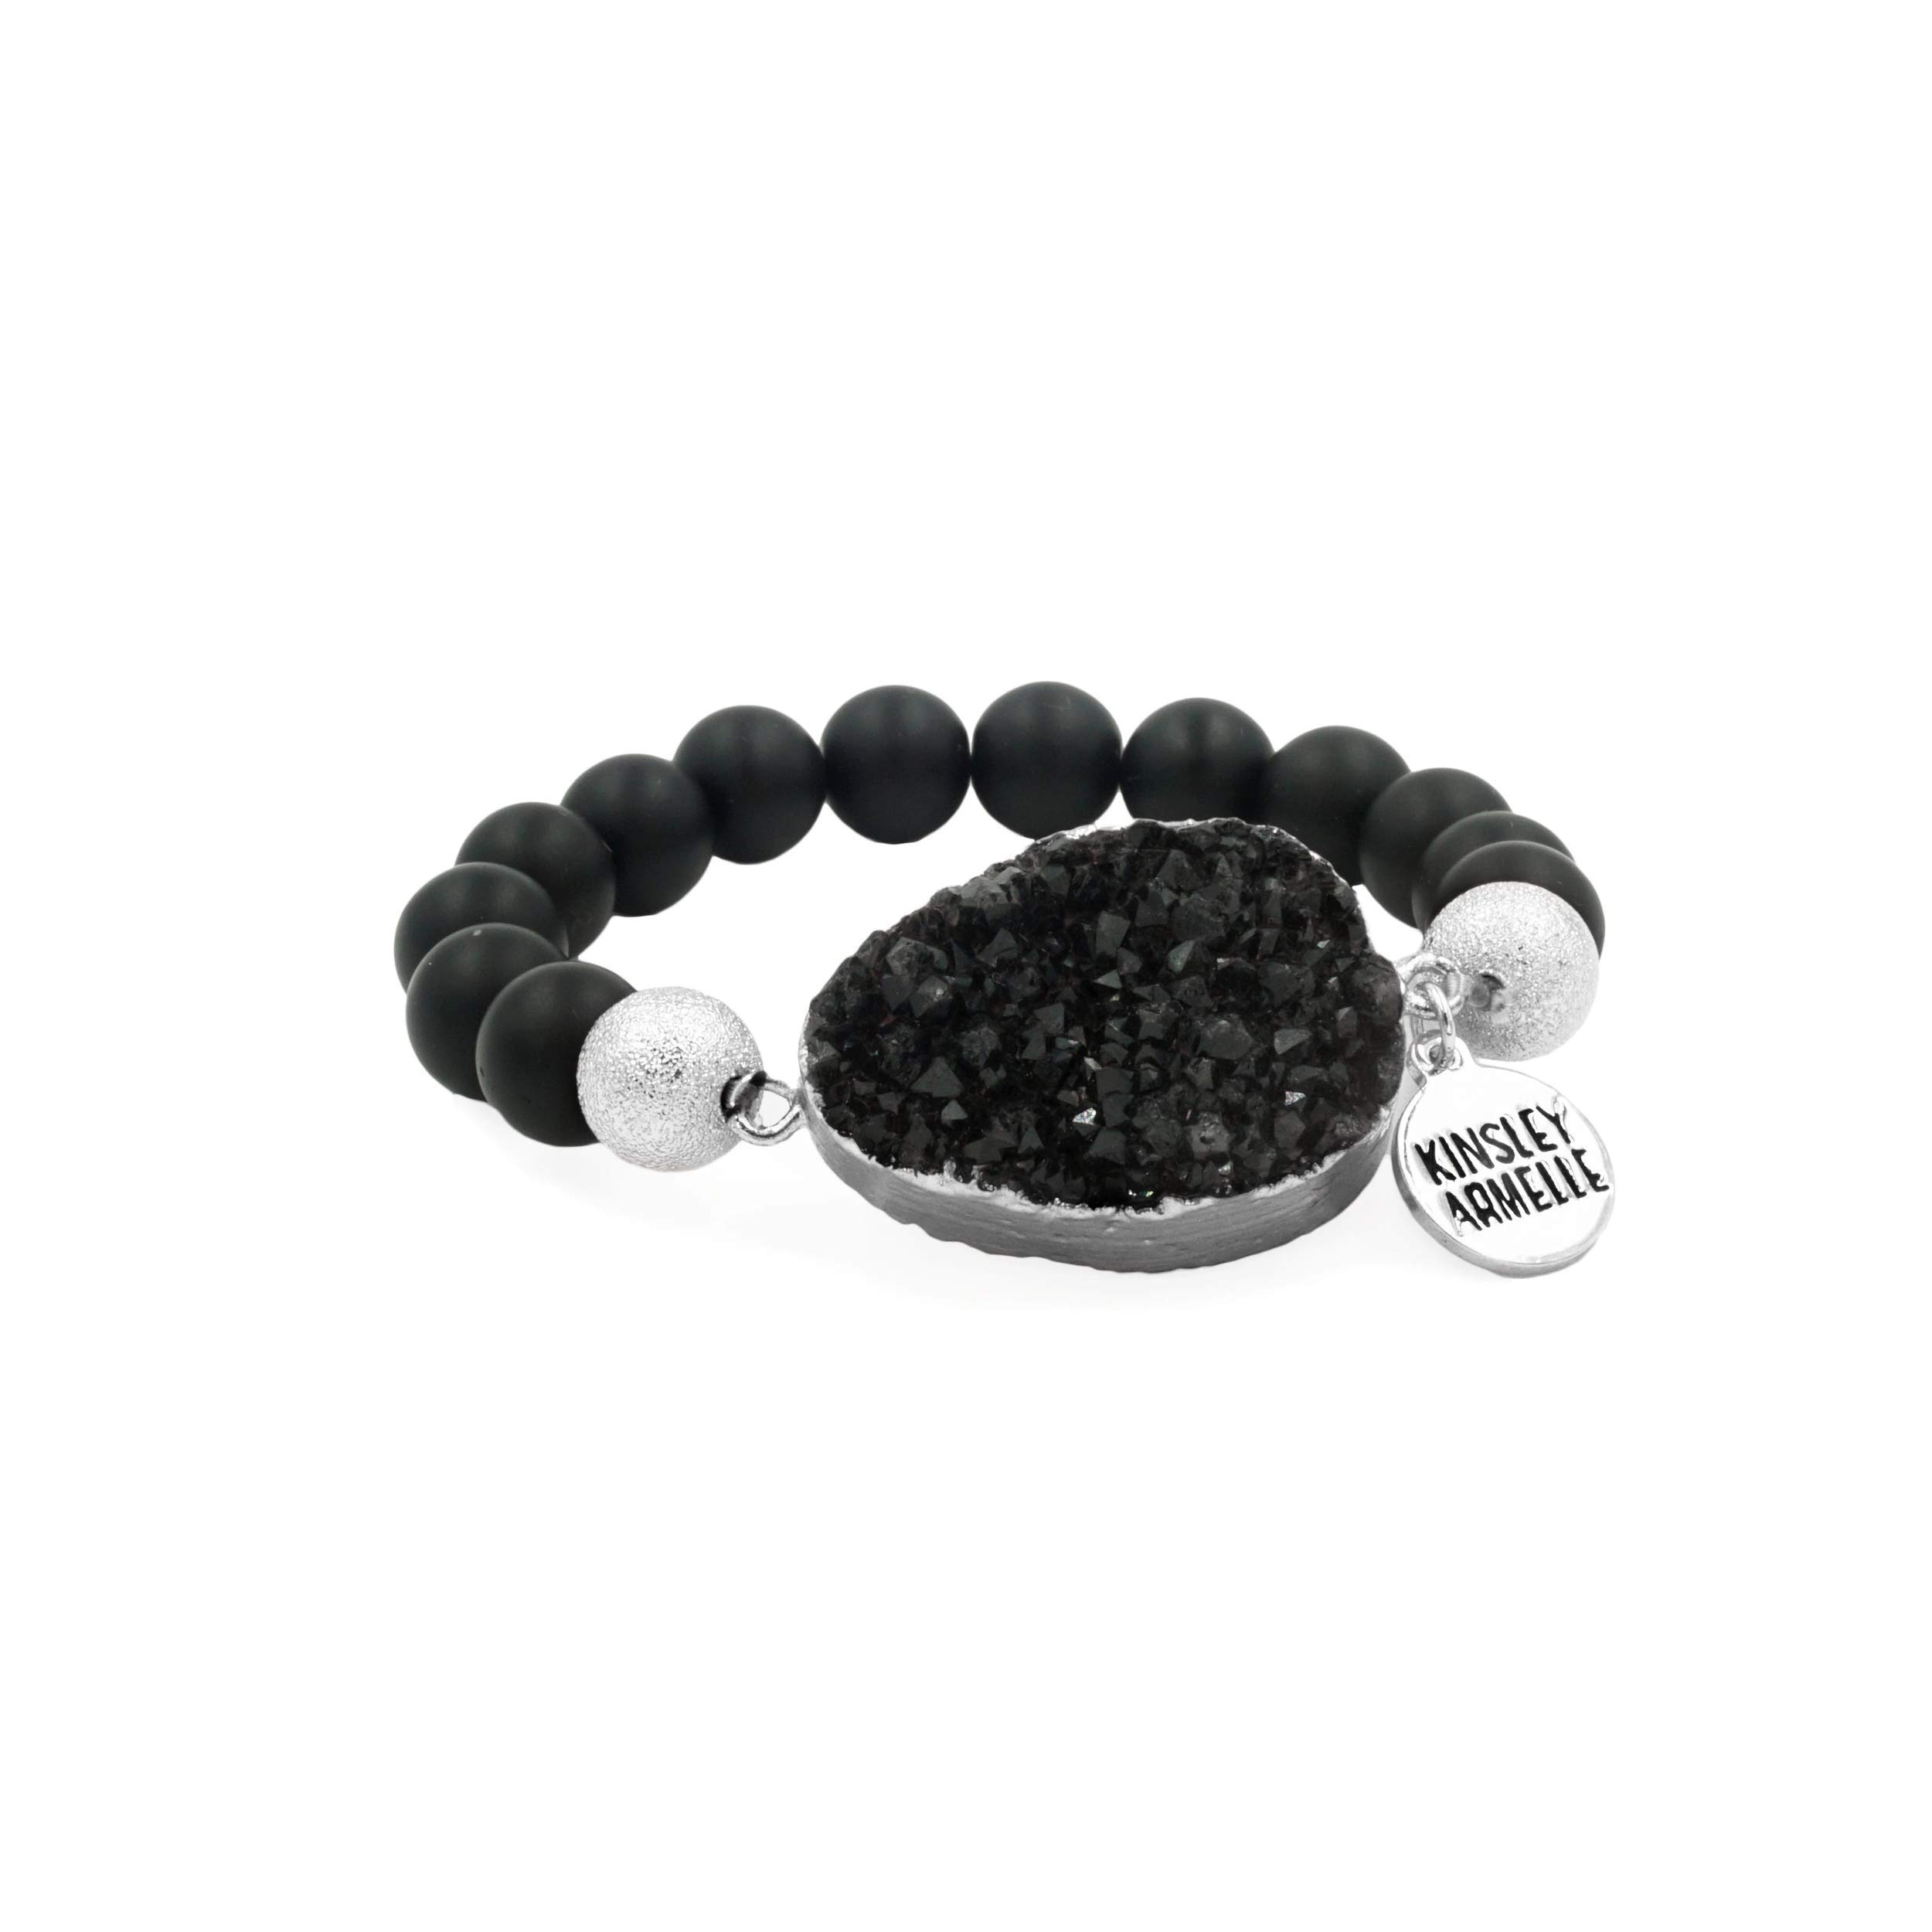 Kinsley Armelle Stone Collection - Silver Coal Bracelet